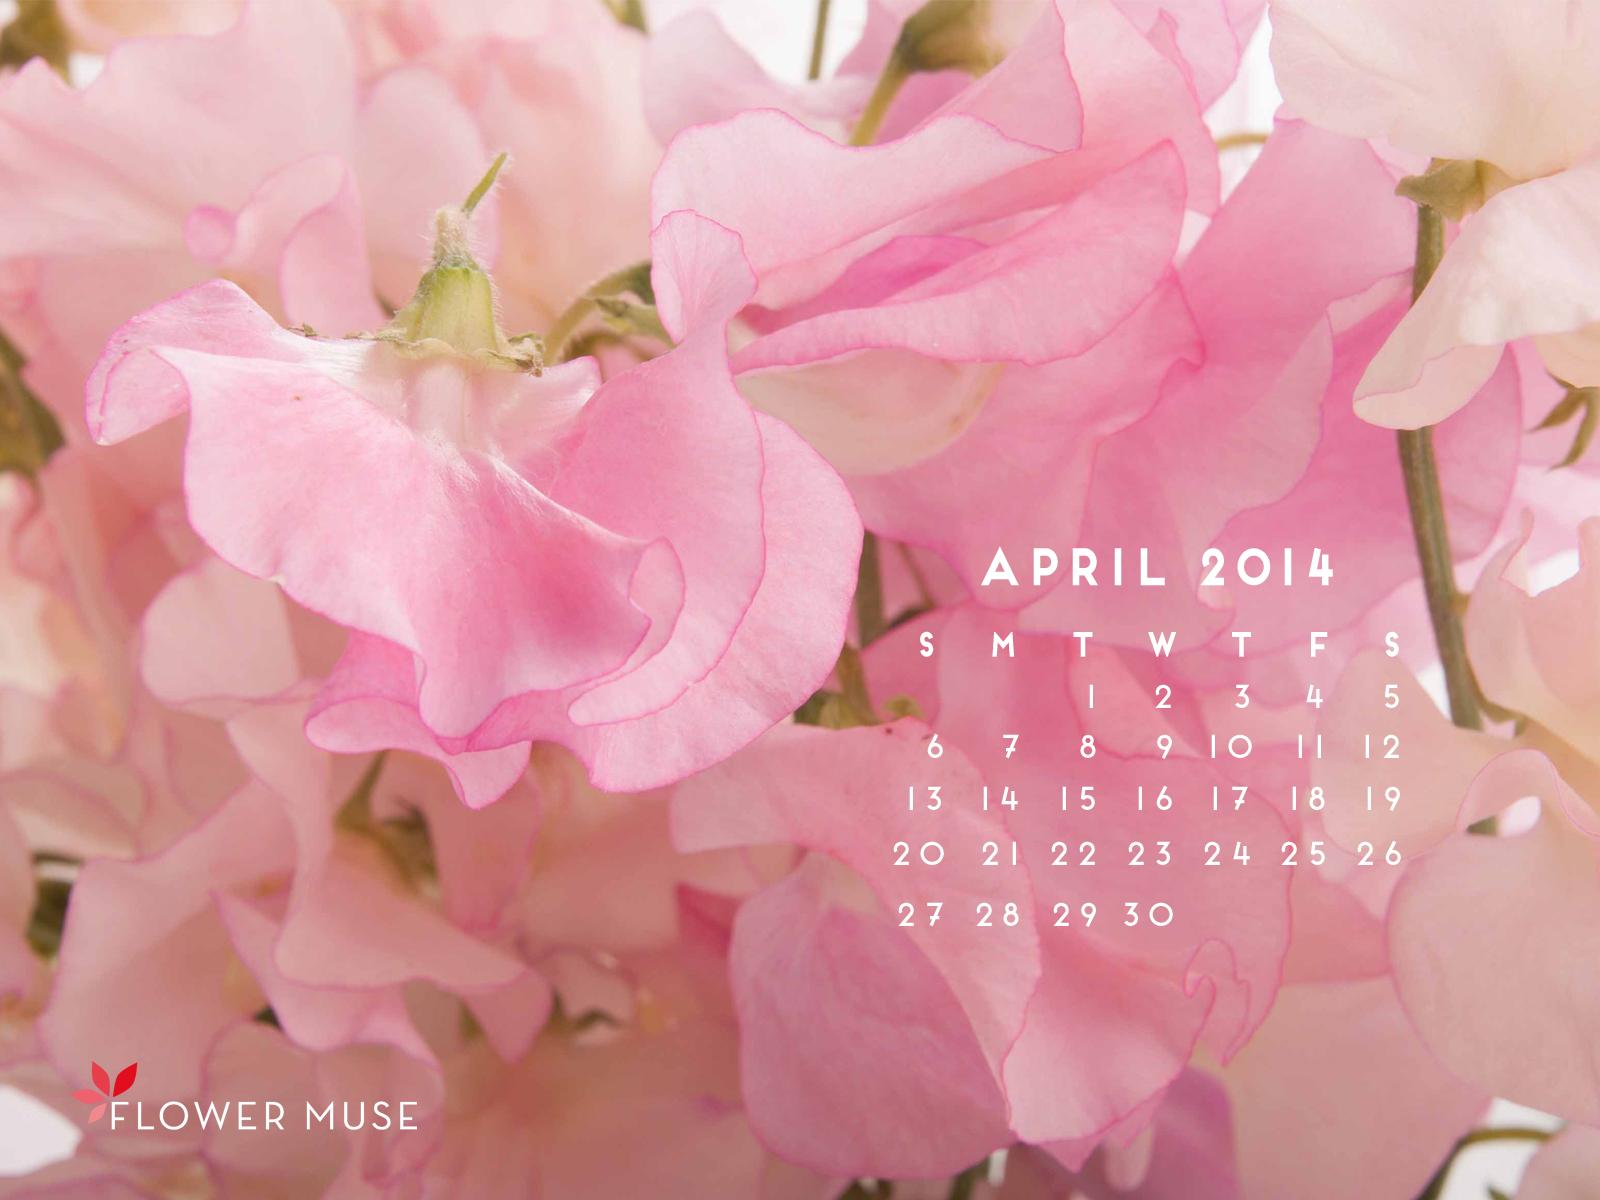 April 2014 Calendar Flower Muse Blog 1600x1200